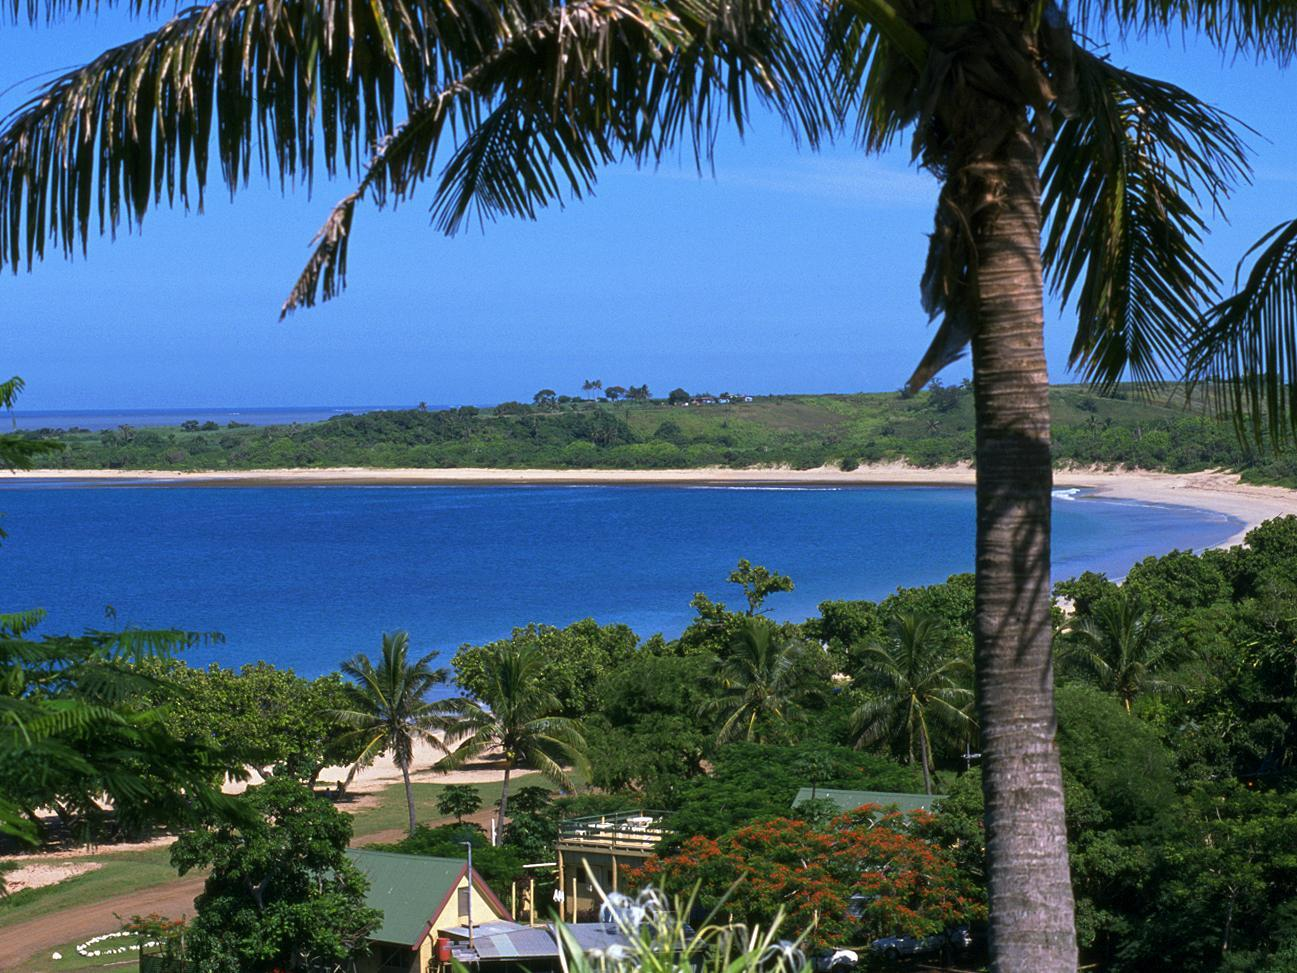 Natadola Beach Resort - Hotels and Accommodation in Fiji, Pacific Ocean And Australia